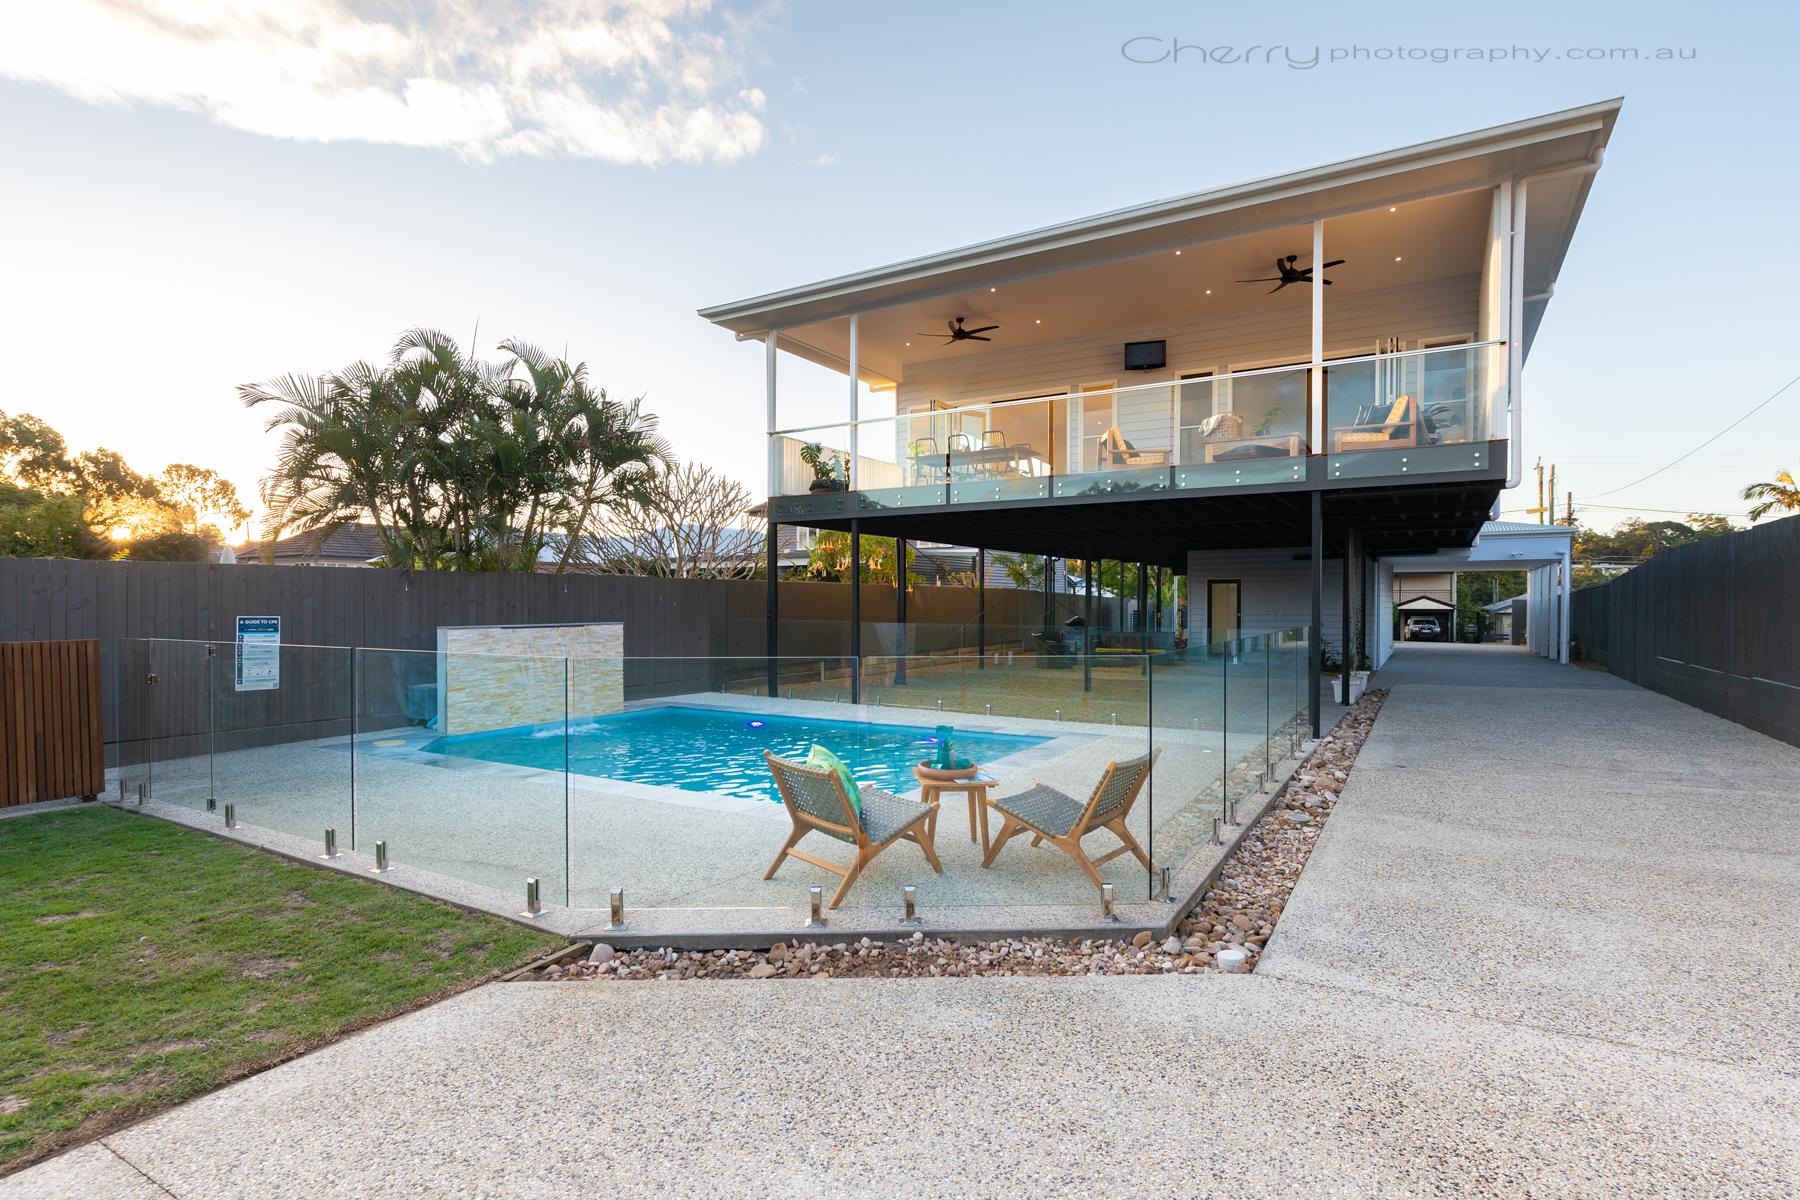 Cherry Photography Real Estate Brisbane